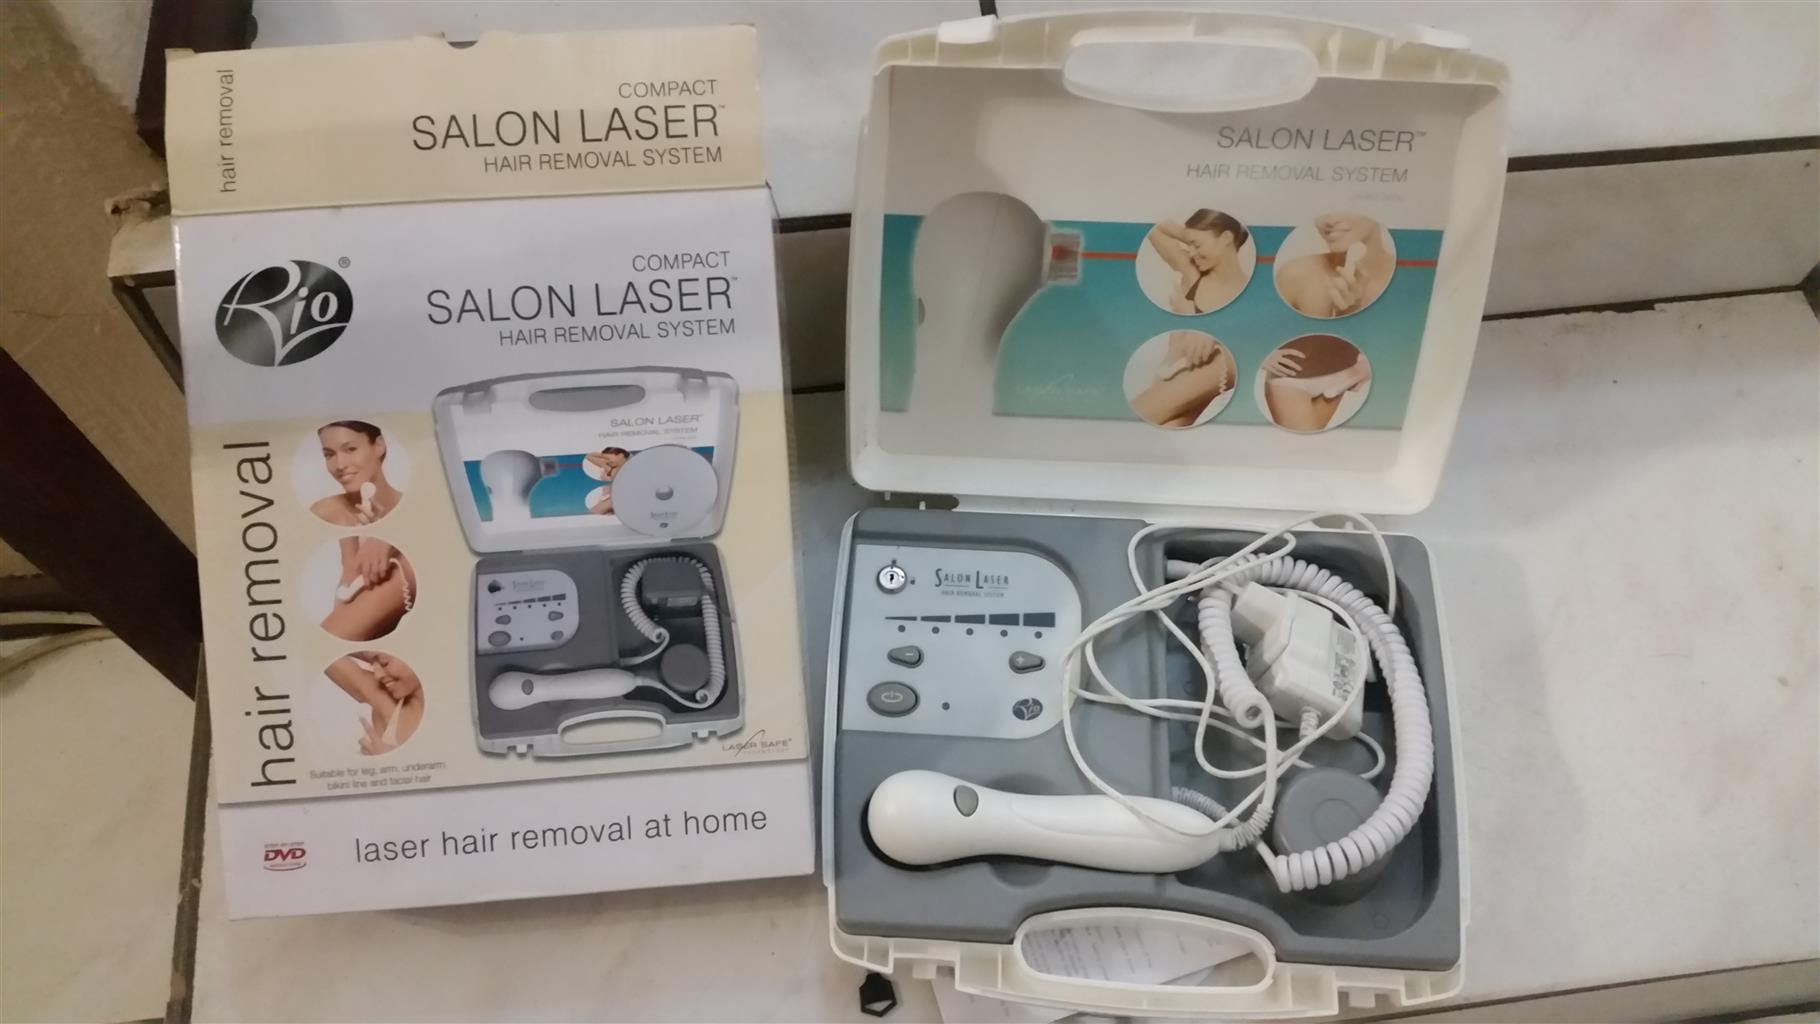 Rio Salon Laser Hair Removal at home machine...